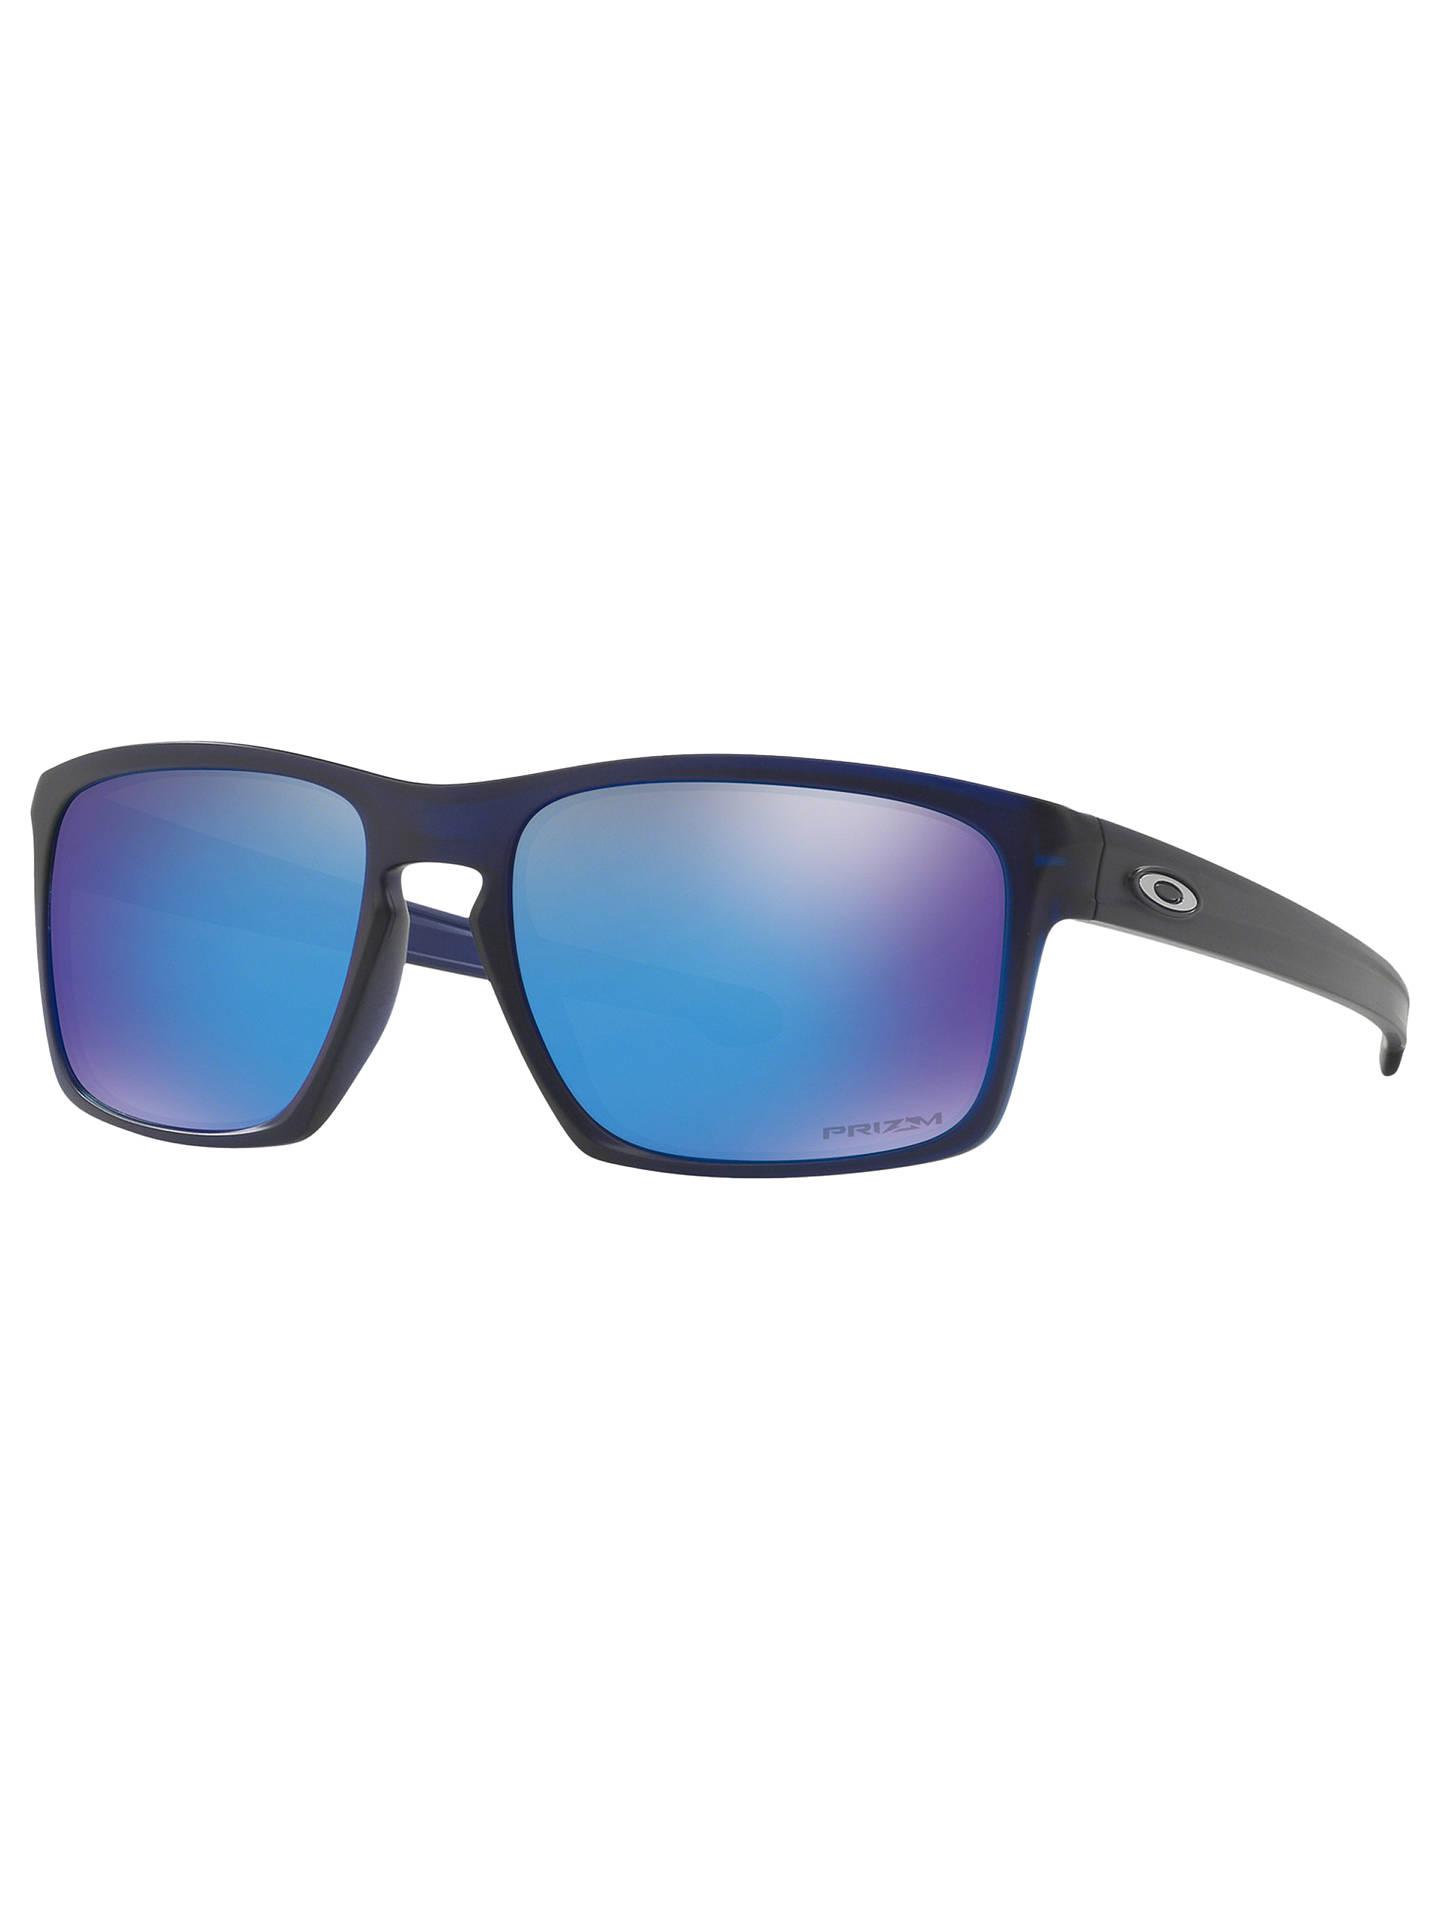 6f13613d7c3 BuyOakley OO9262 Men s Sliver Polarised Sunglasses